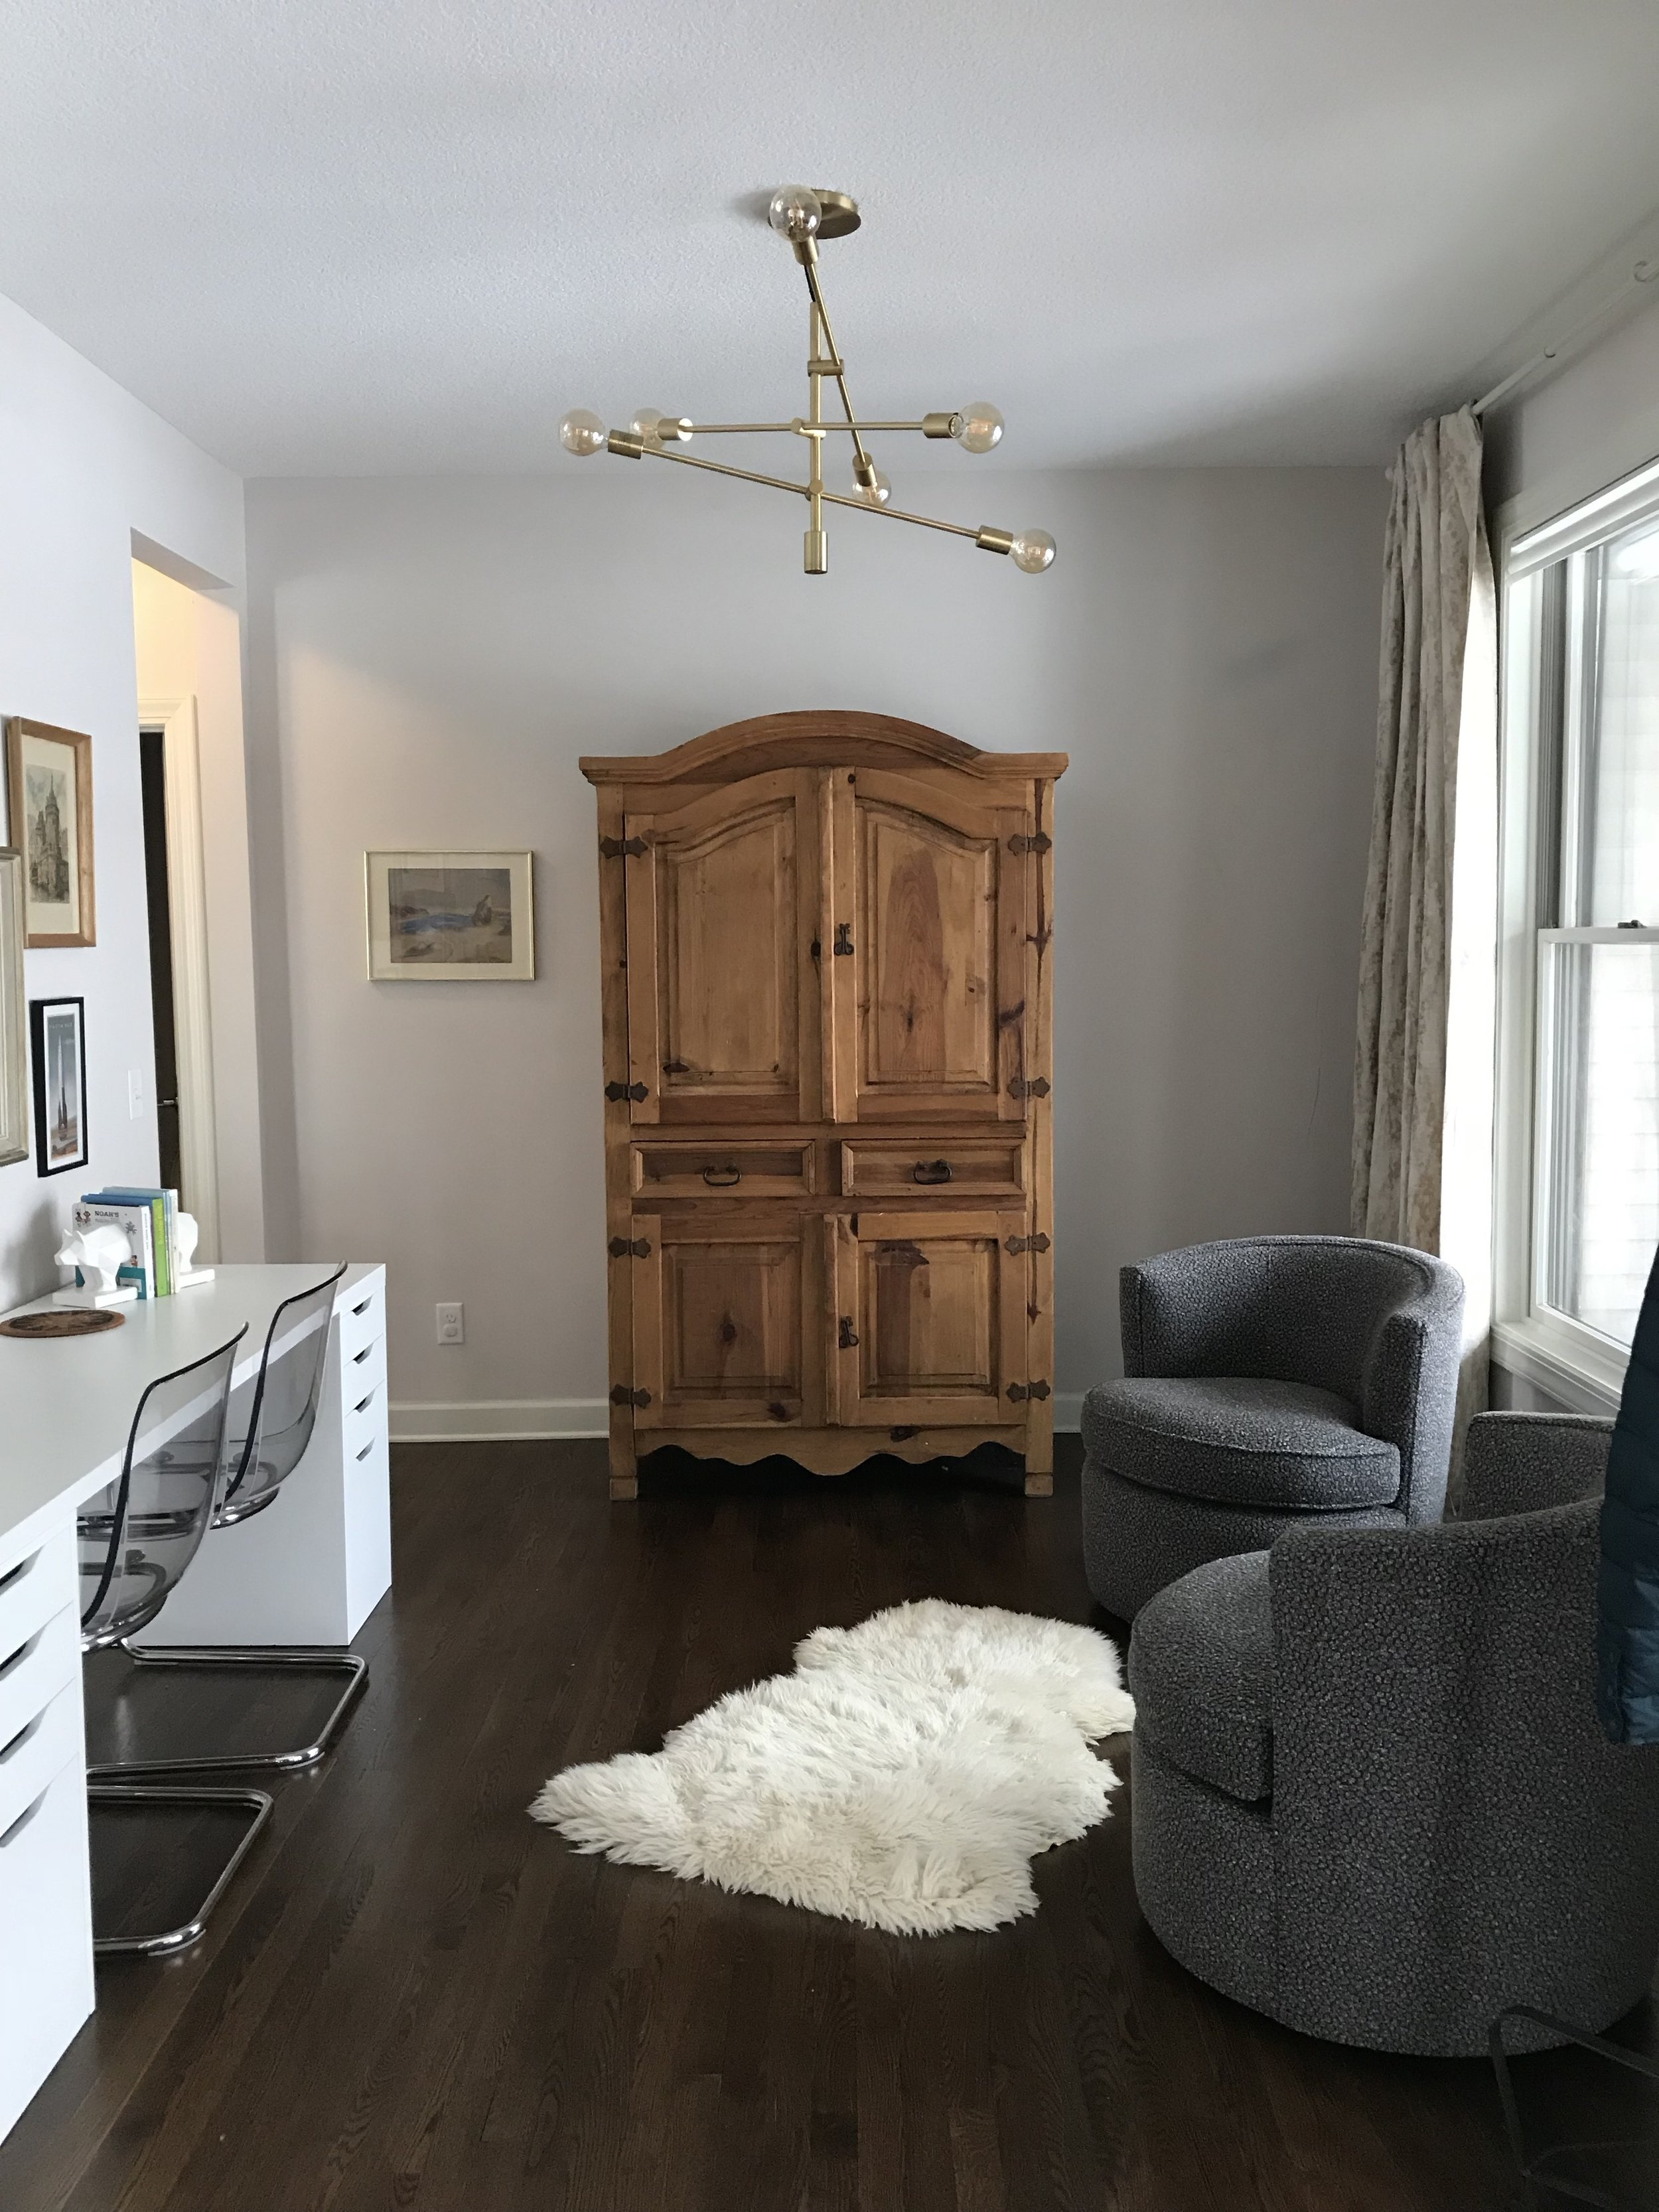 Pine bureau in a modern office with sheep skin rug.